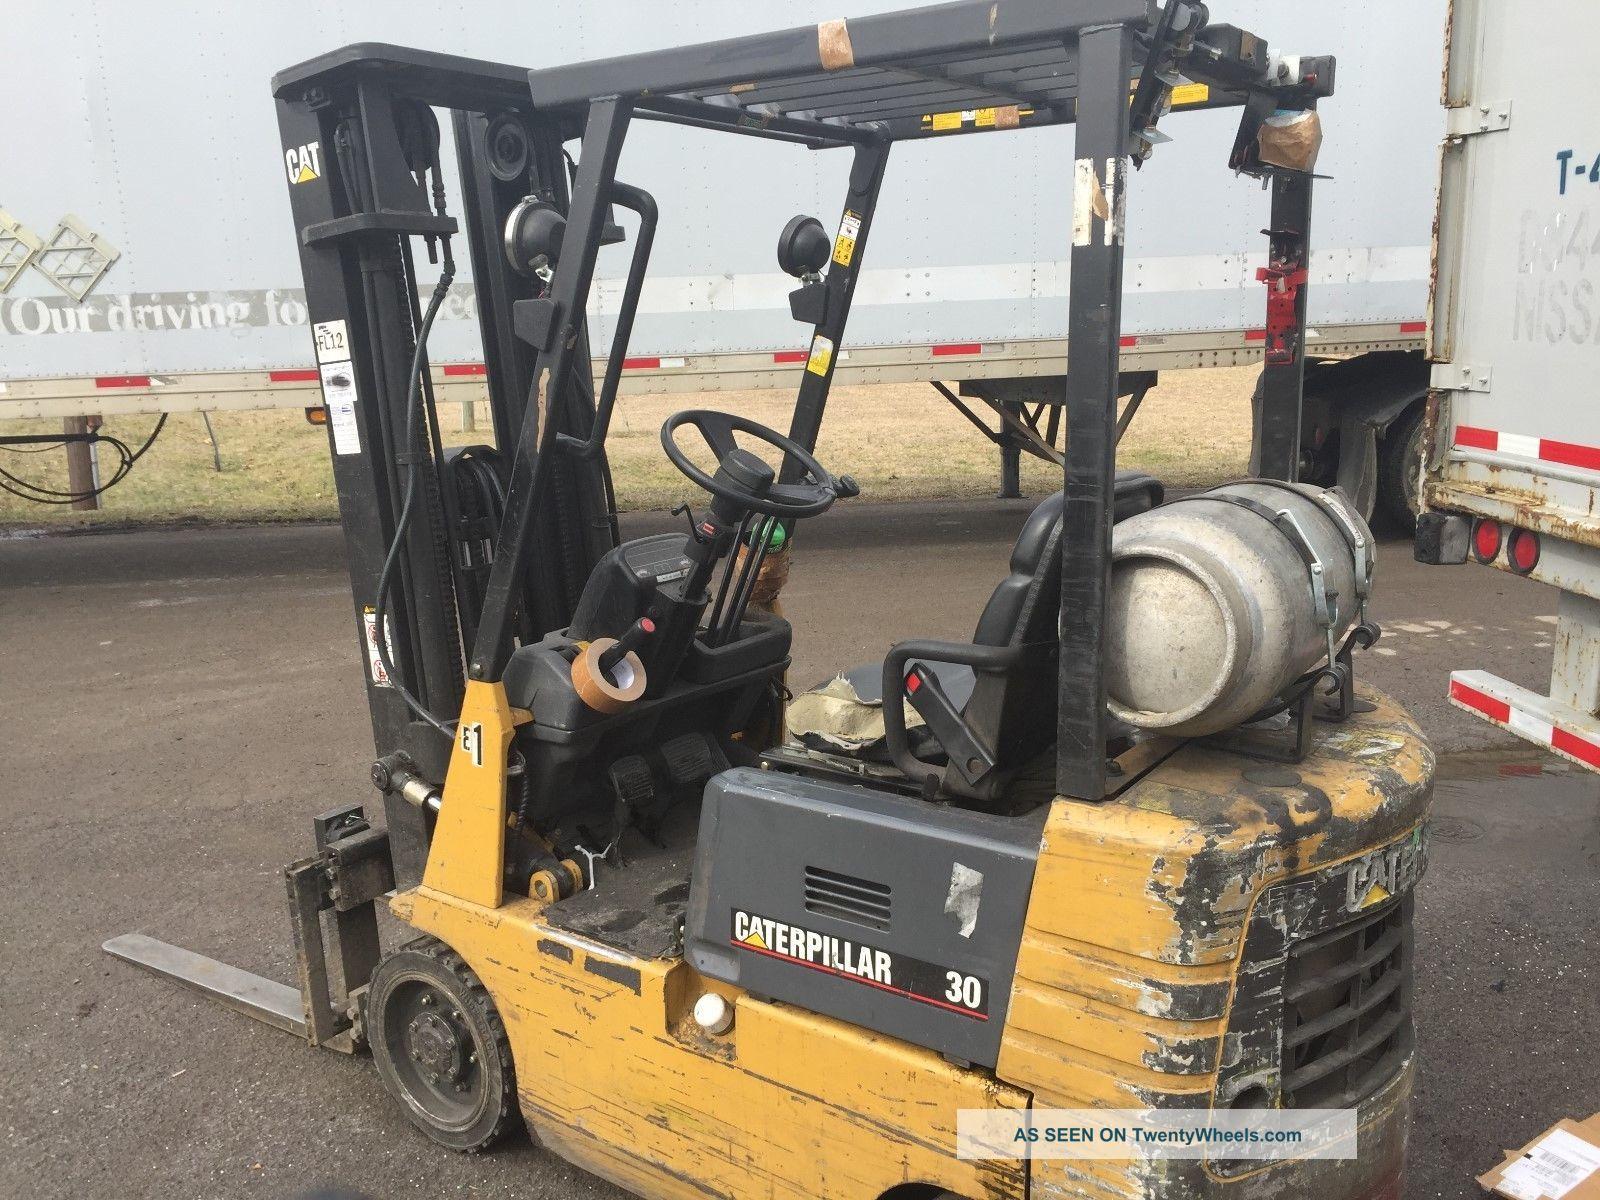 Catepillar 30 Forklift Lpg Propane 3 Stage Mast Cat 3000lb